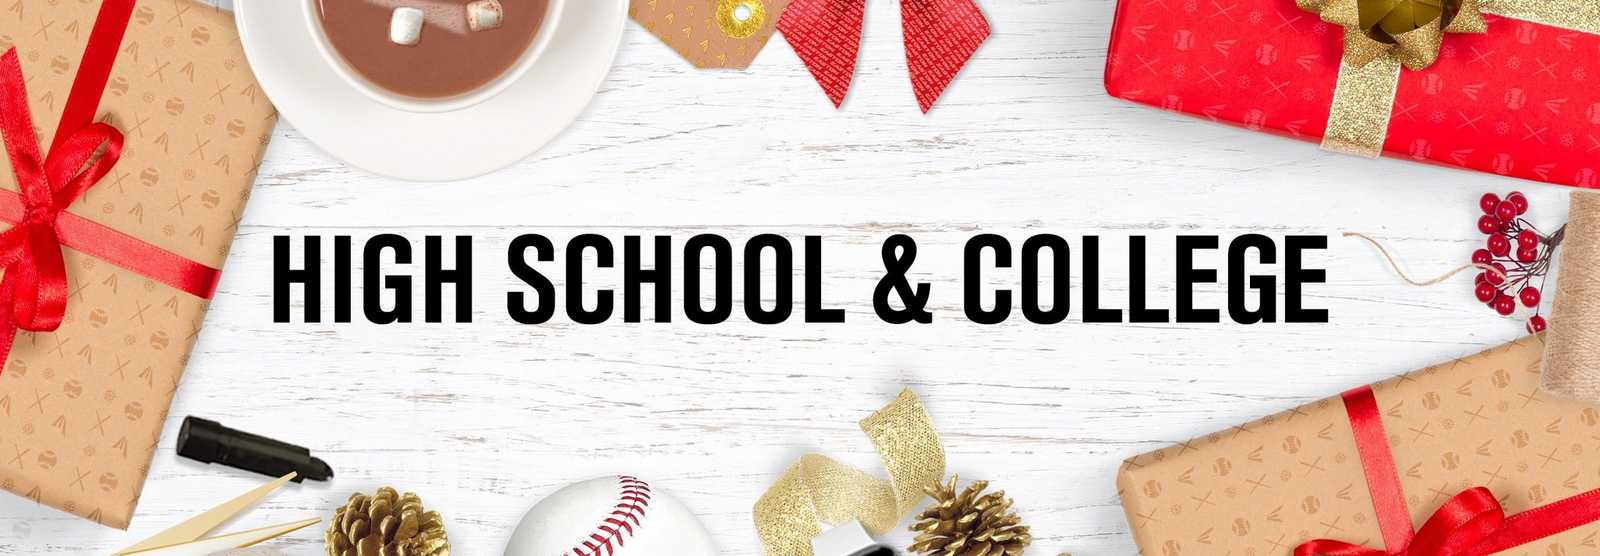 2020-baseball-high-school-college-gift-guide